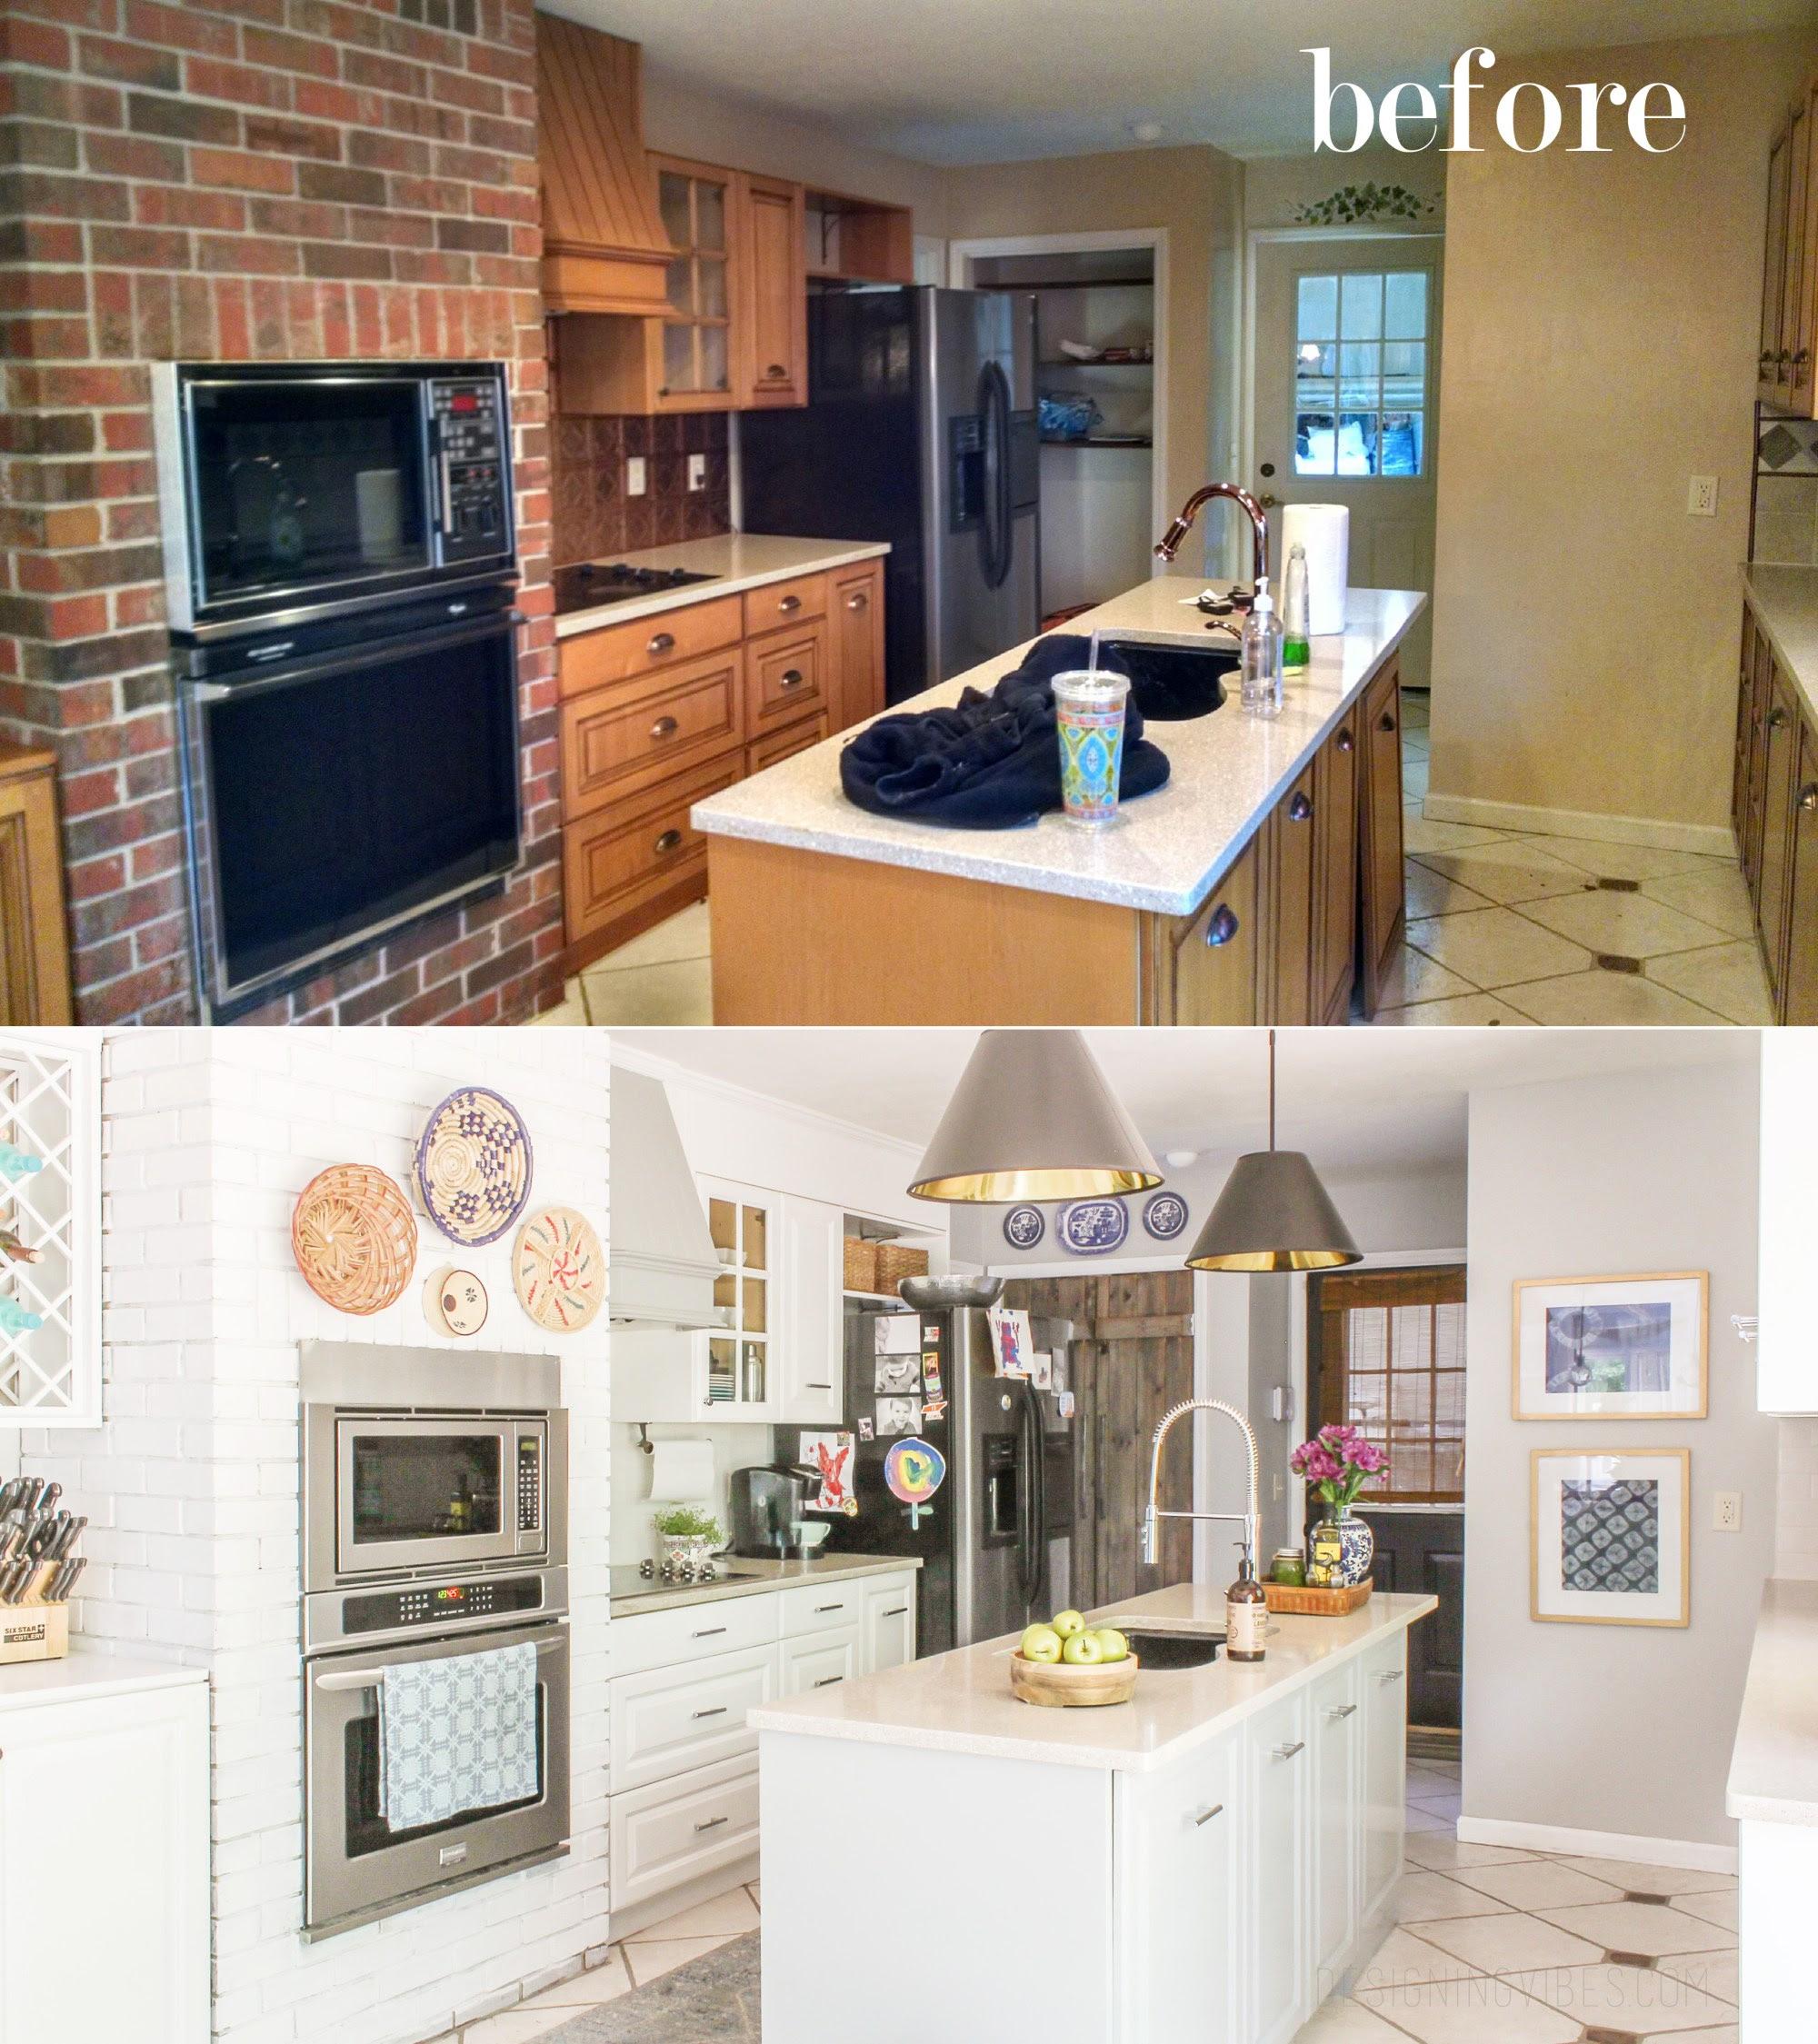 5 Diy Budget Kitchen Renovations - diy Thought